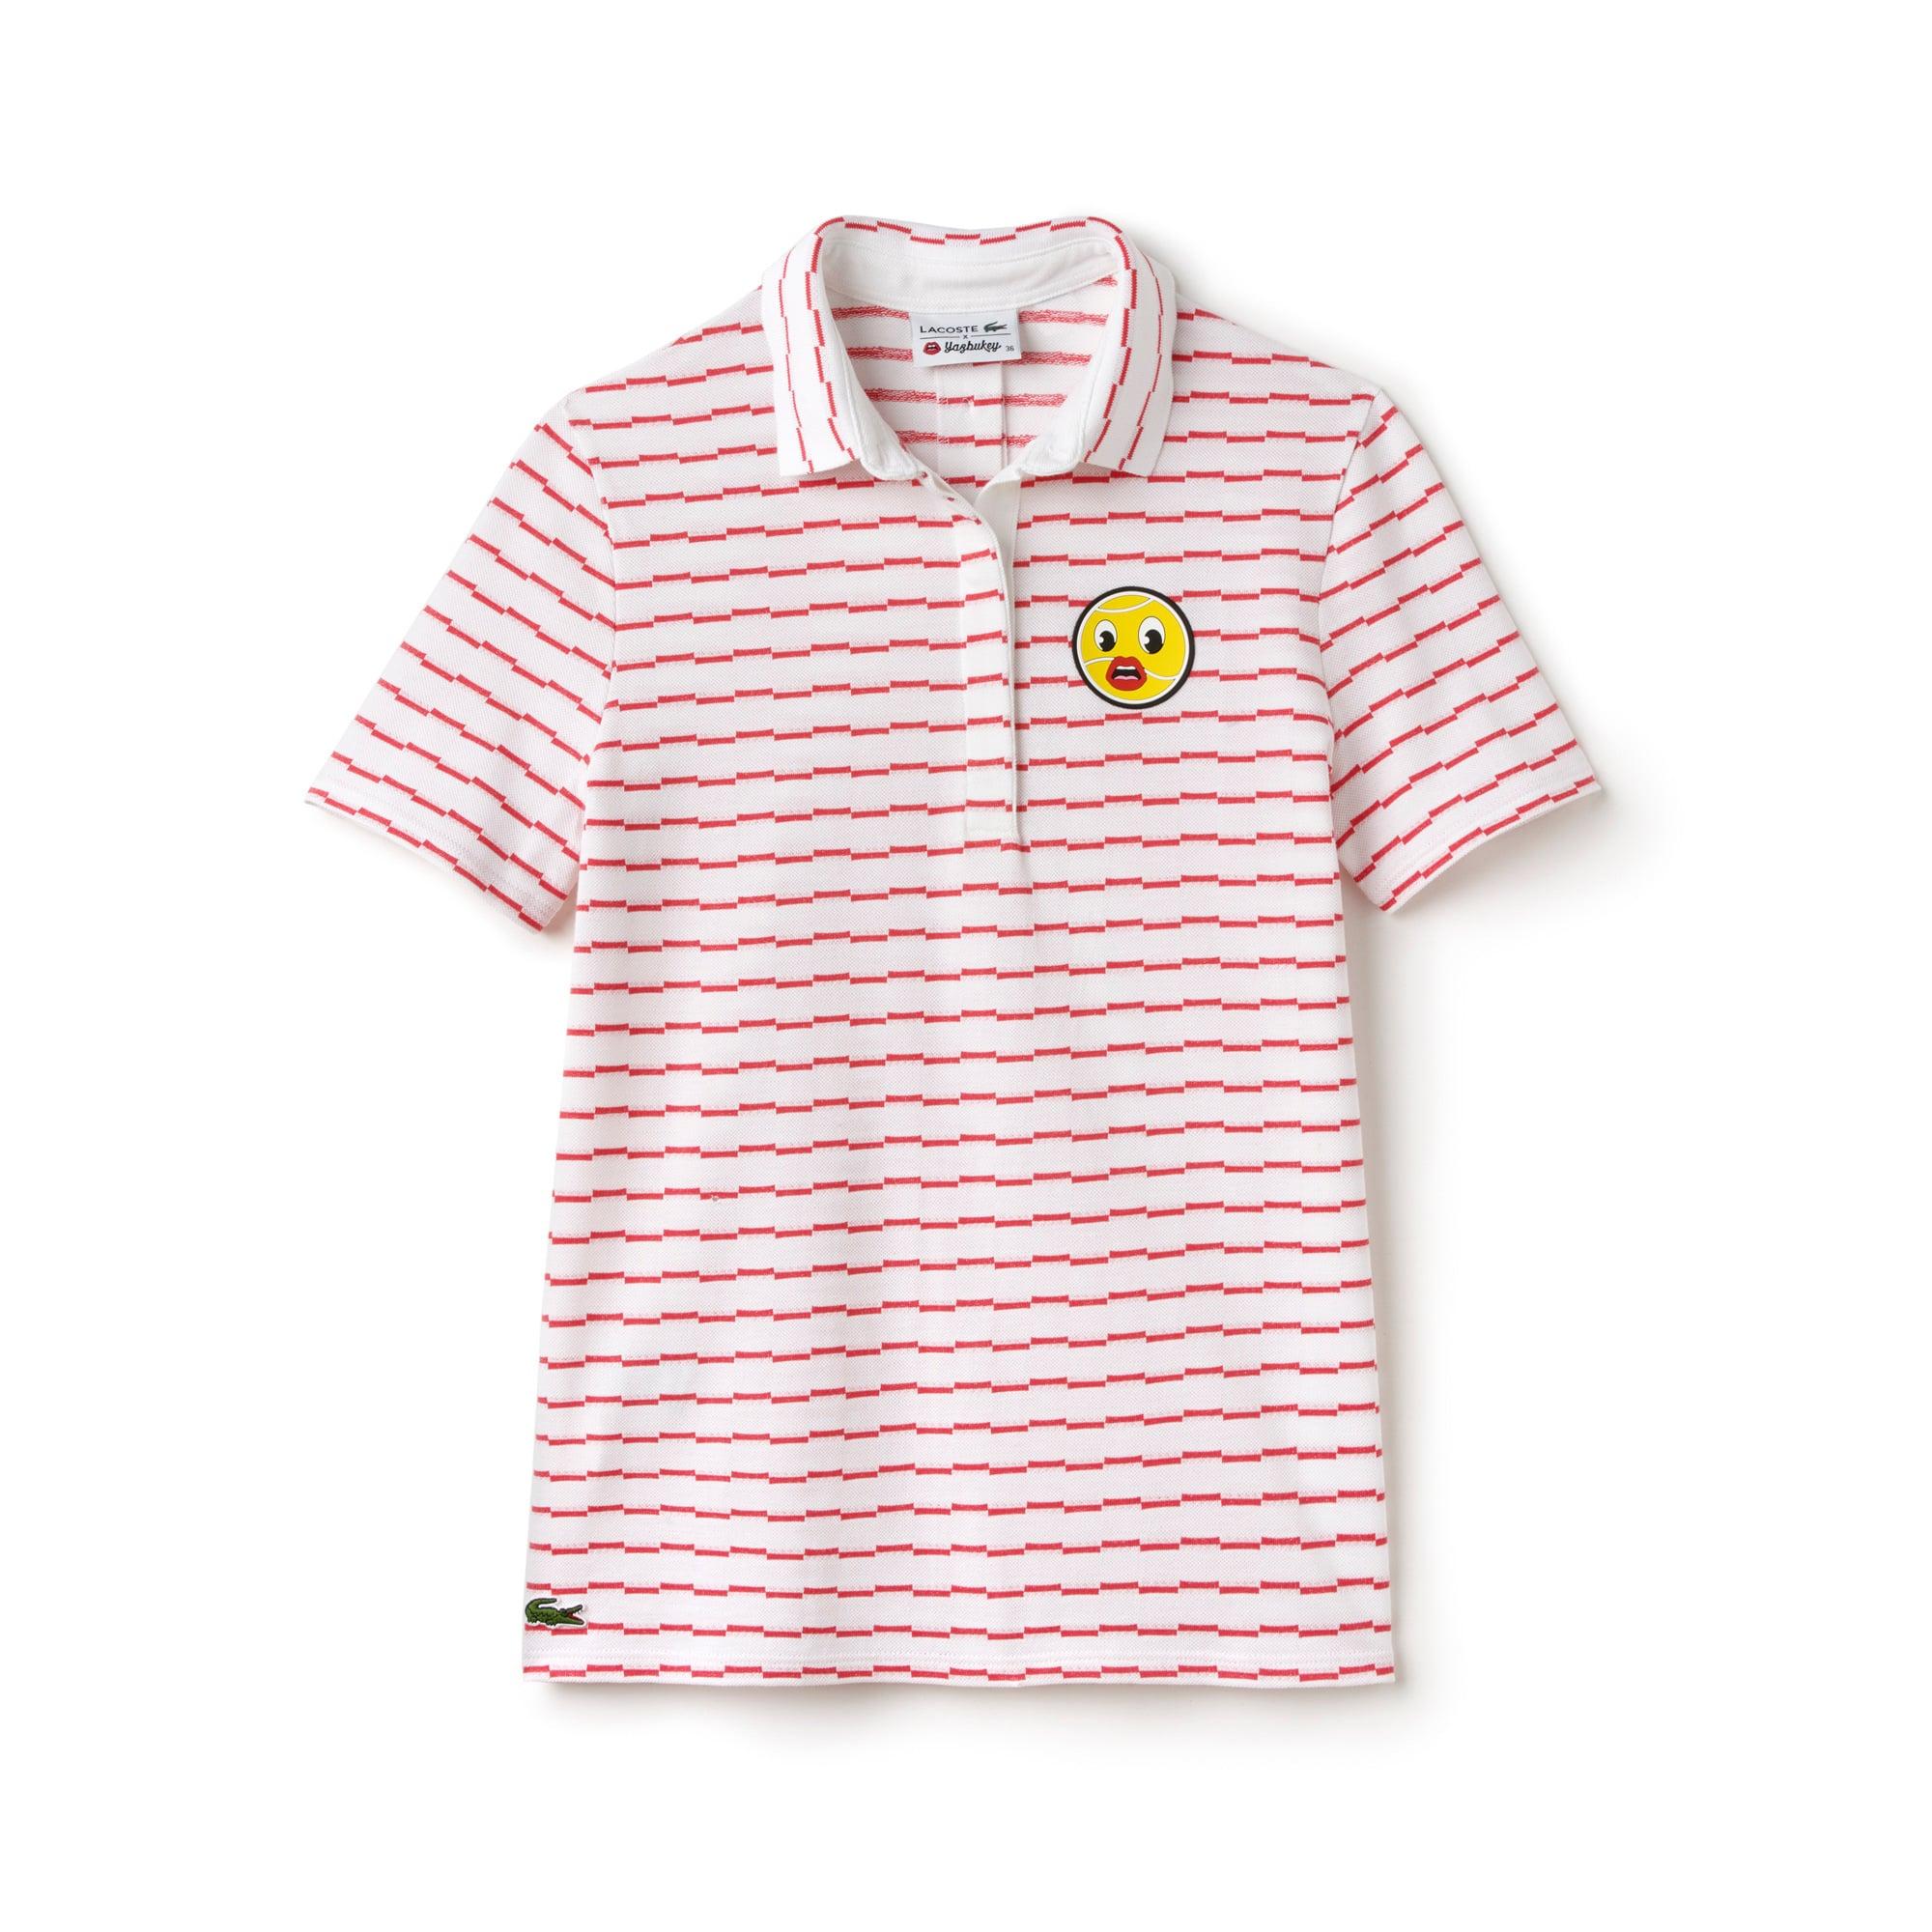 Women's Yazbukey Edition Offbeat Stripe Jacquard Polo Shirt